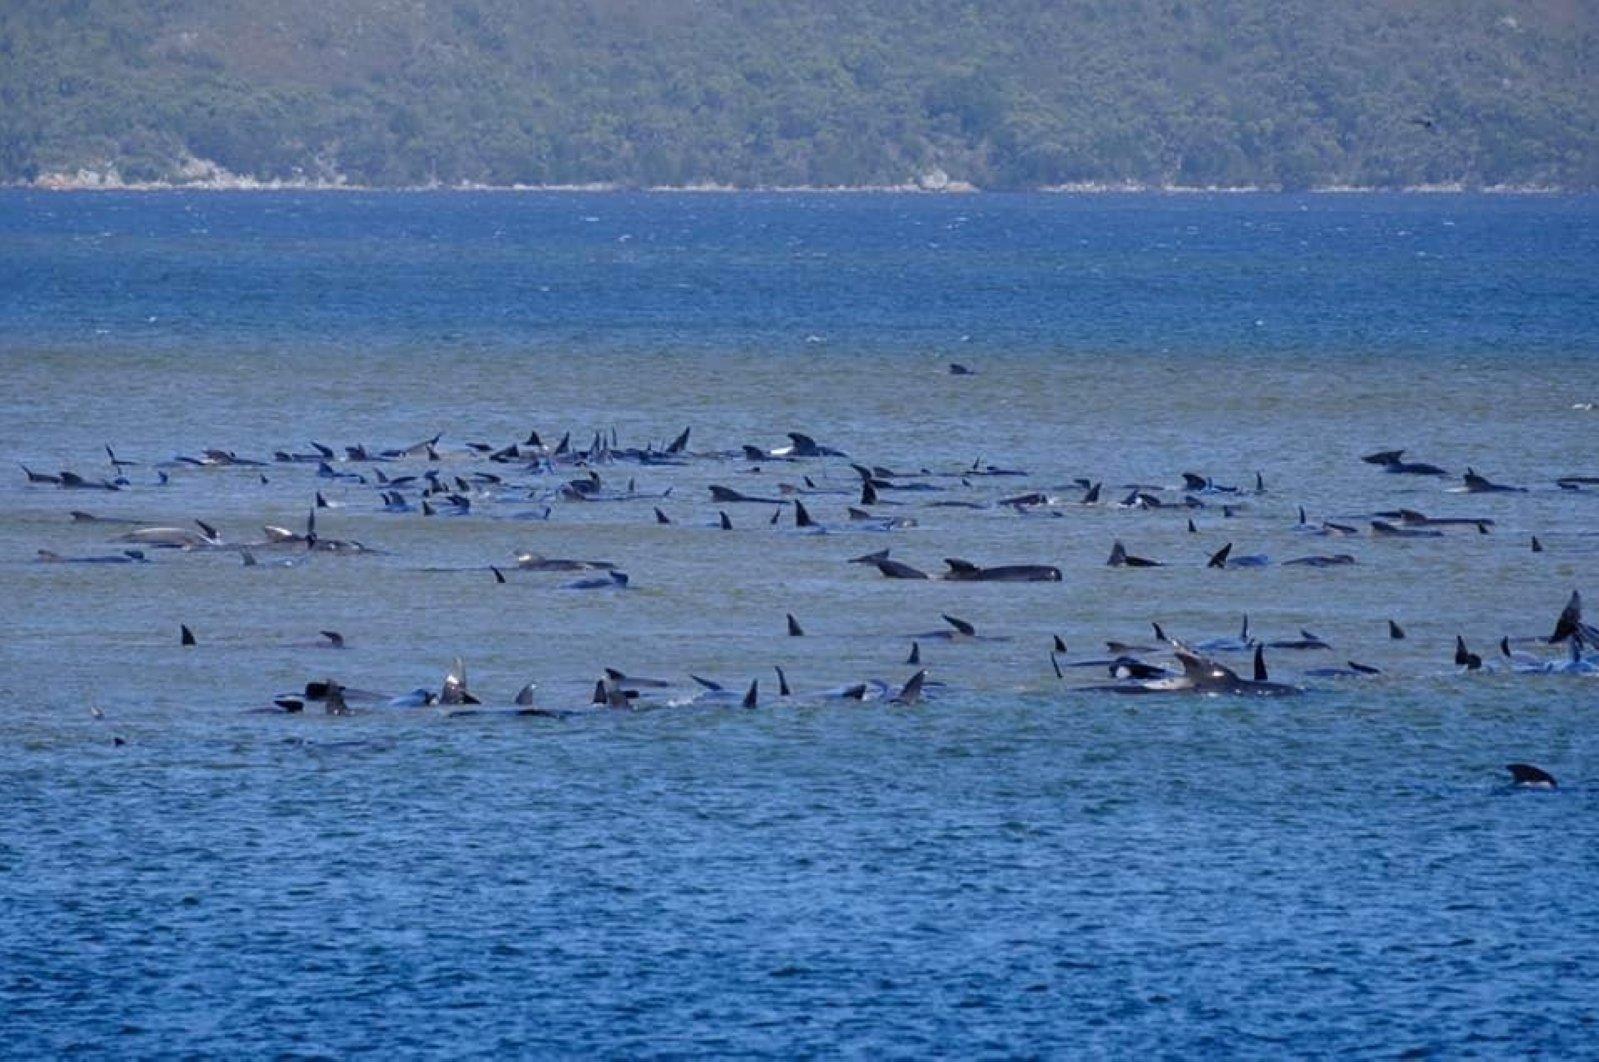 Around 270 whales stranded on sandbar off Australia's island of Tasmania |  Daily Sabah